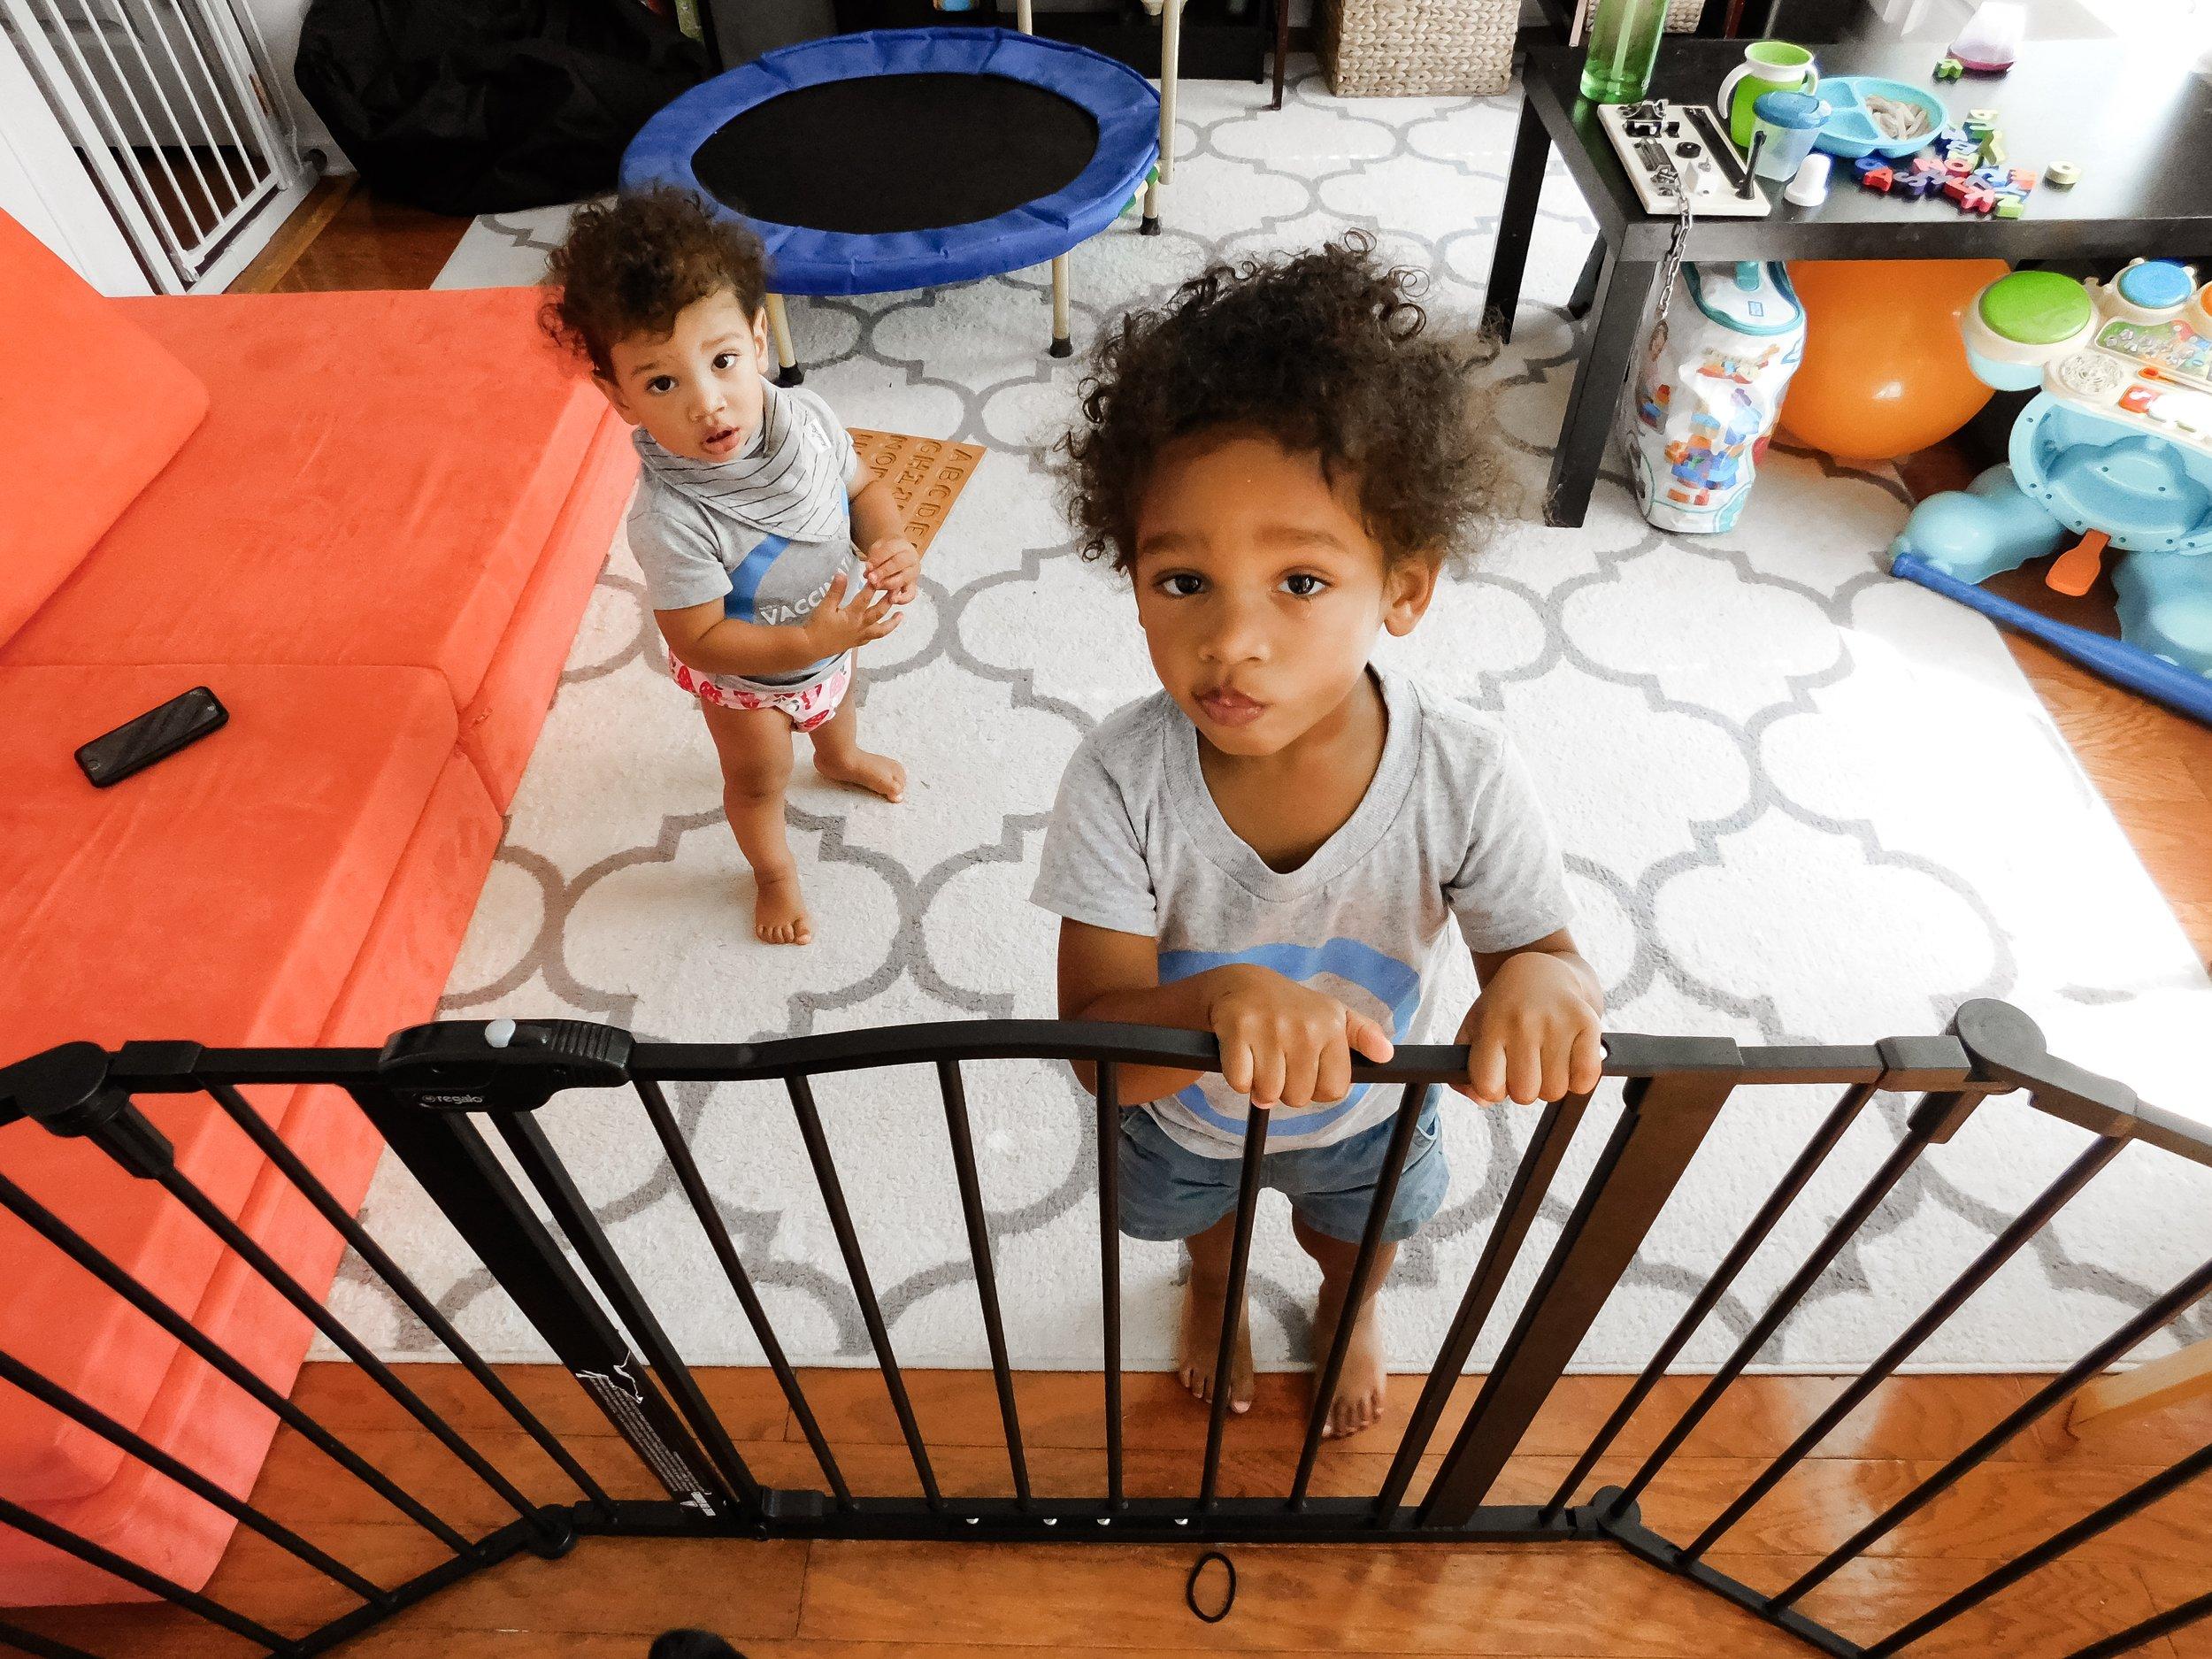 Got them locked in baby jail.